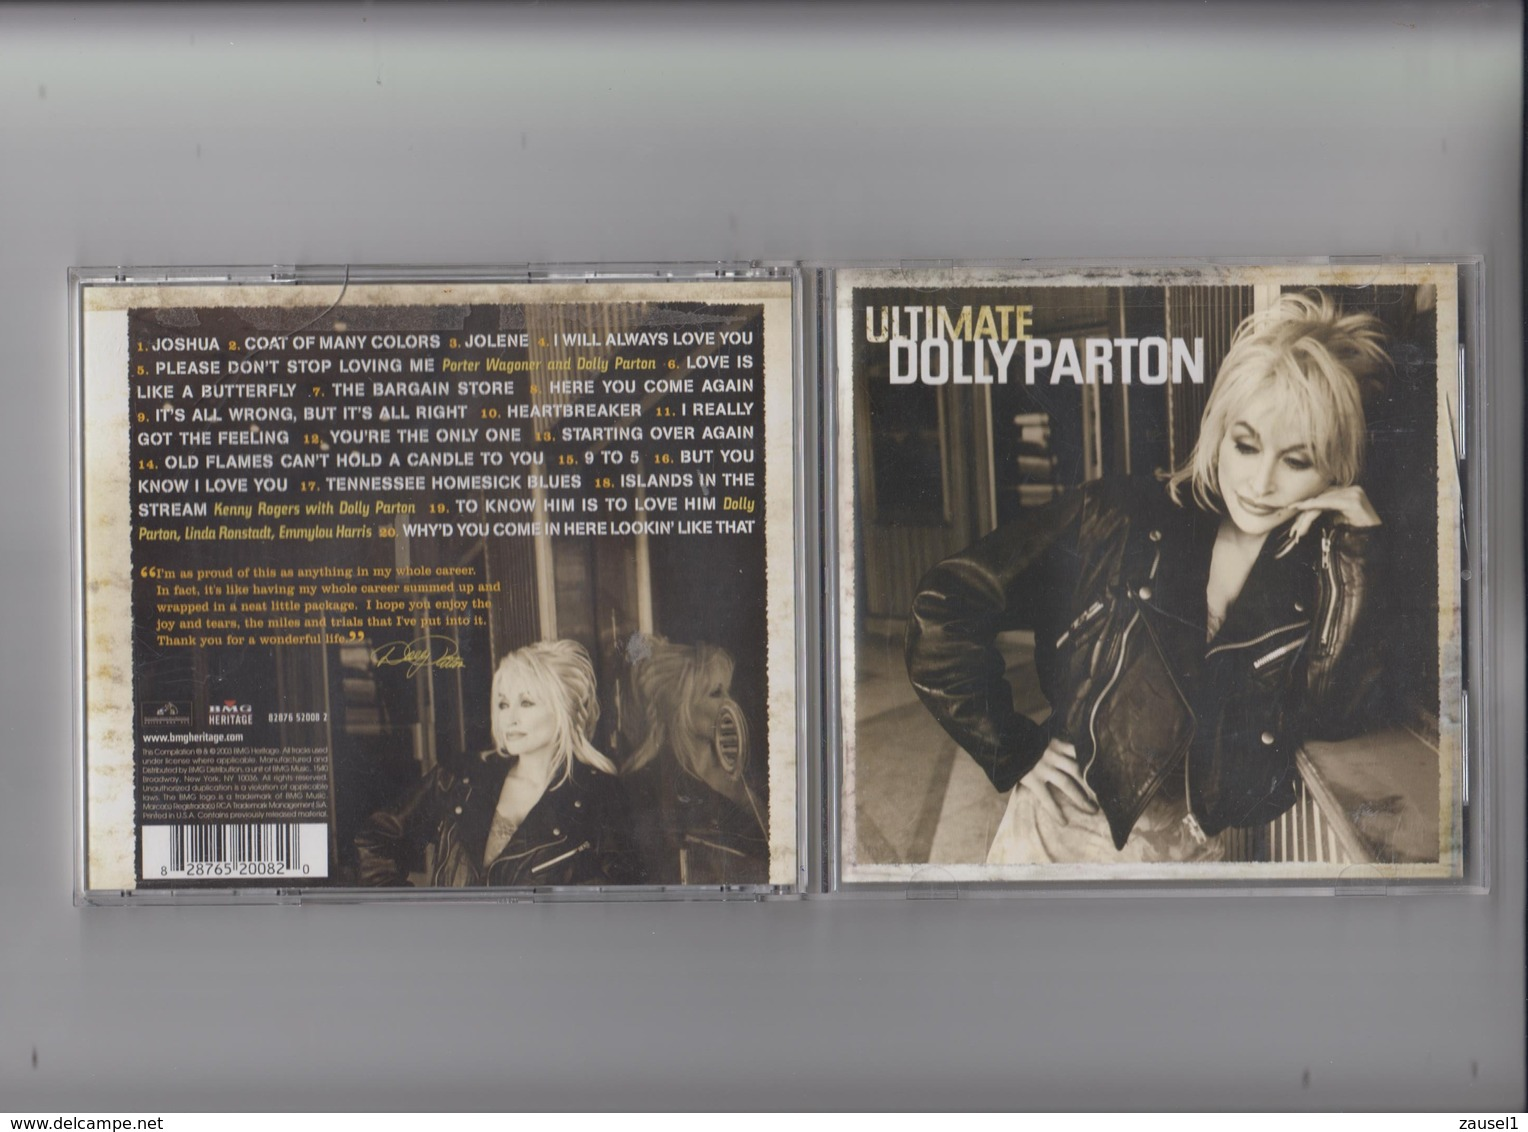 Ultimate Dolly Parton -  Original CD - Country & Folk